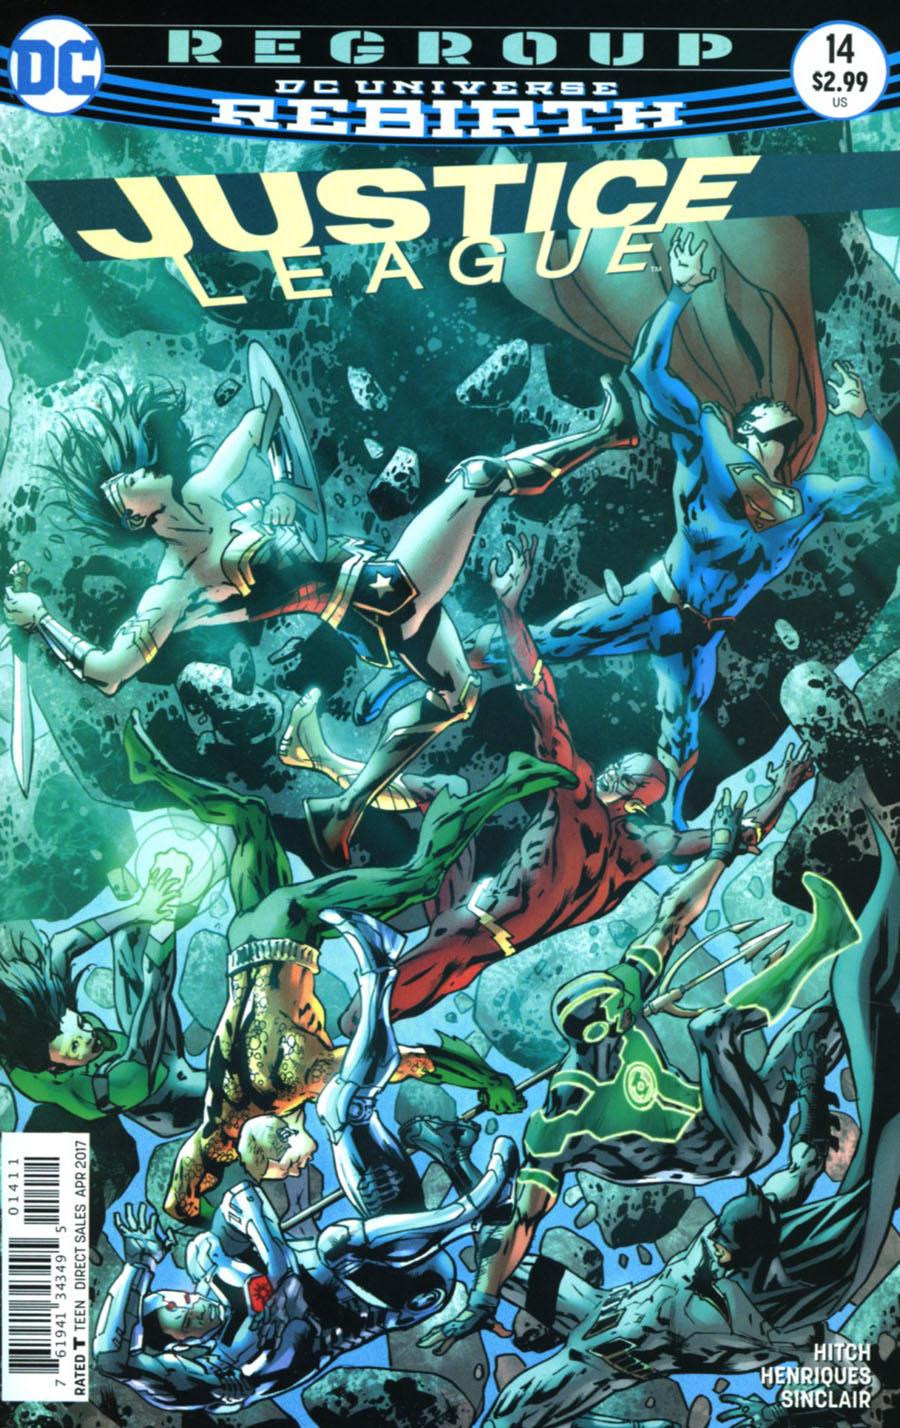 Justice League Vol 3 #14 Cover A Regular Bryan Hitch Cover